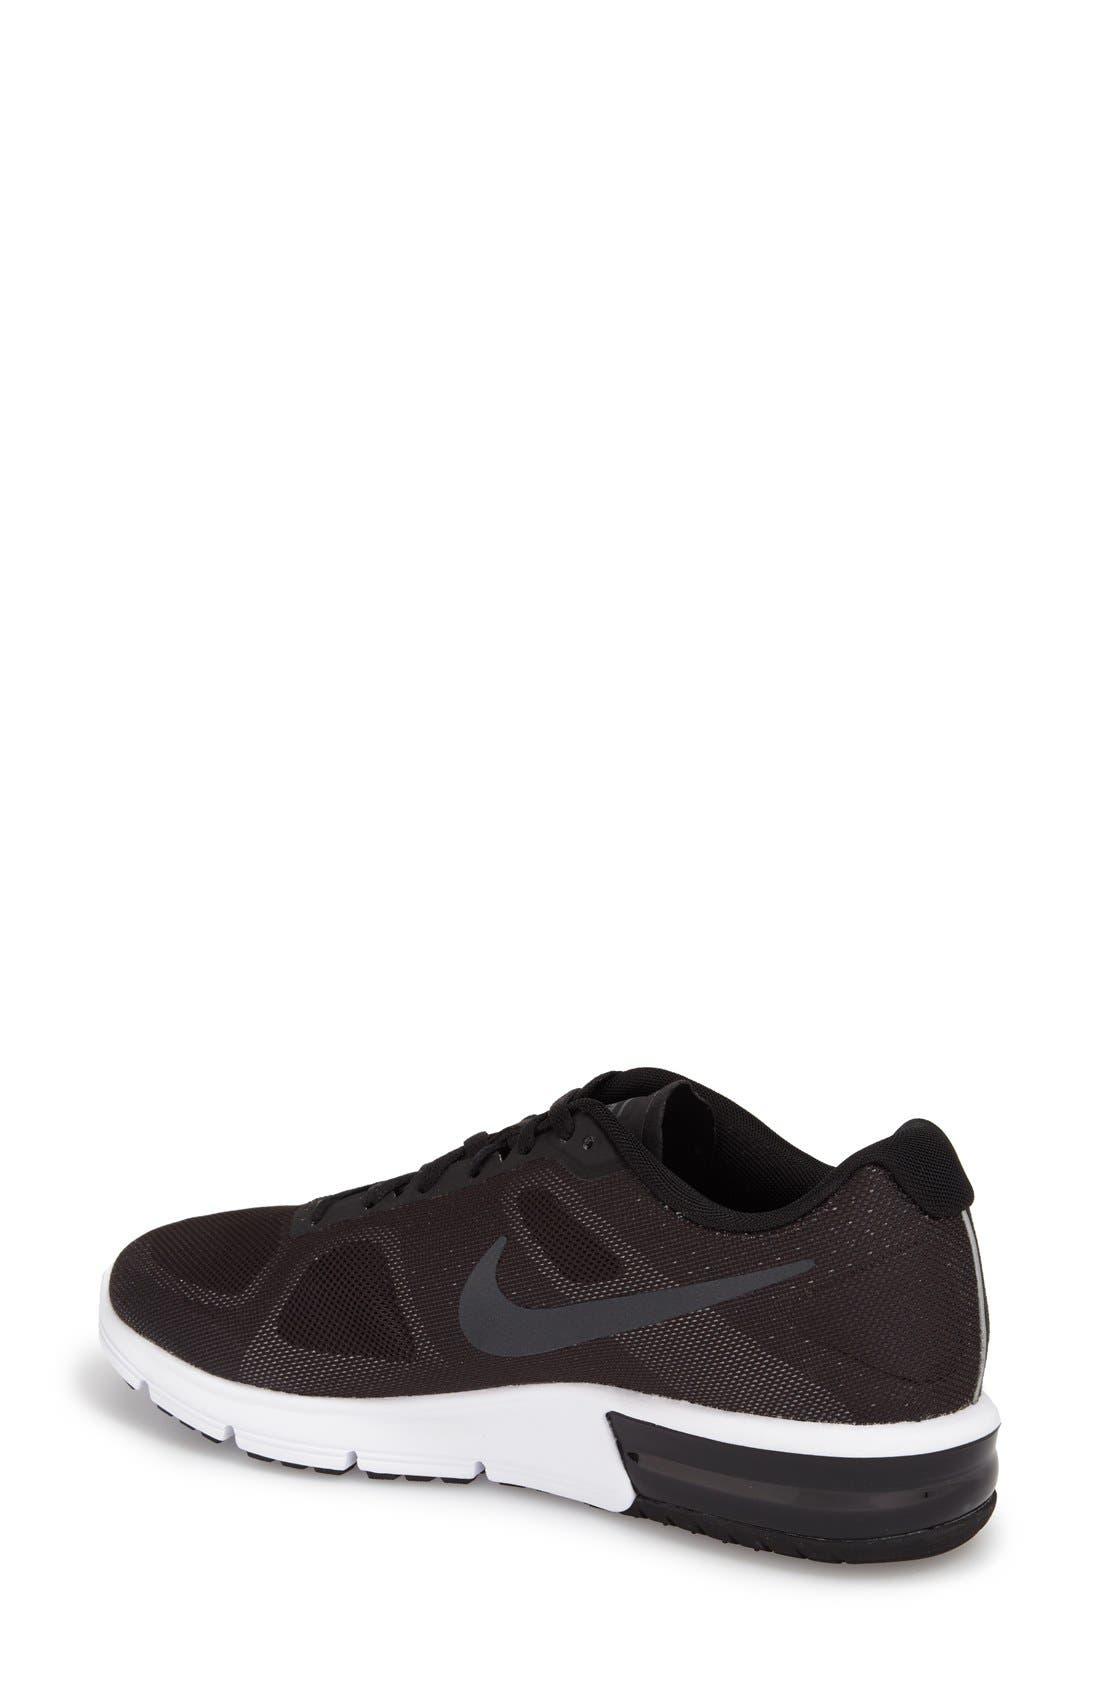 Alternate Image 2  - Nike 'Air Max Sequent' Running Shoe (Women)